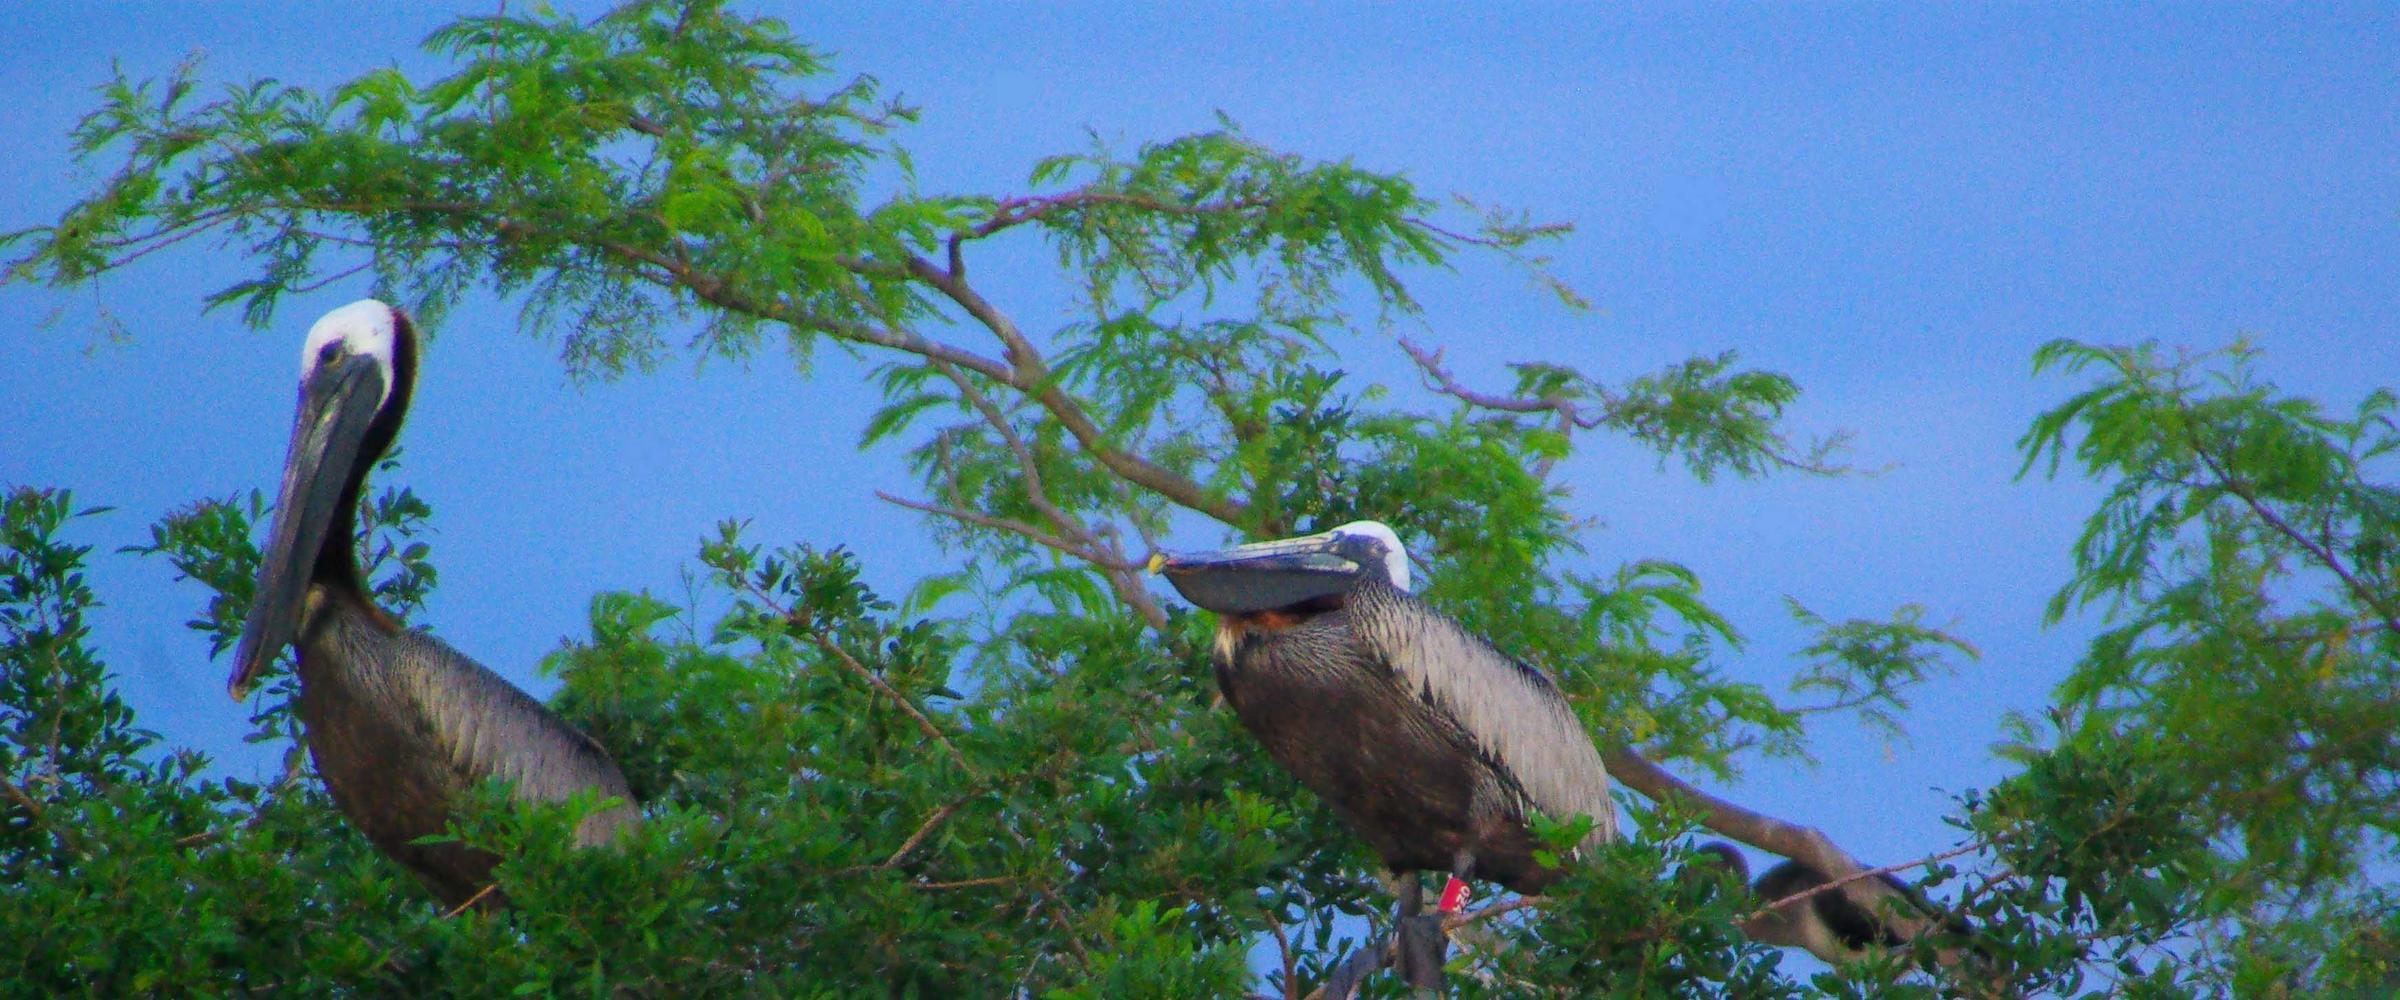 banded brown pelican